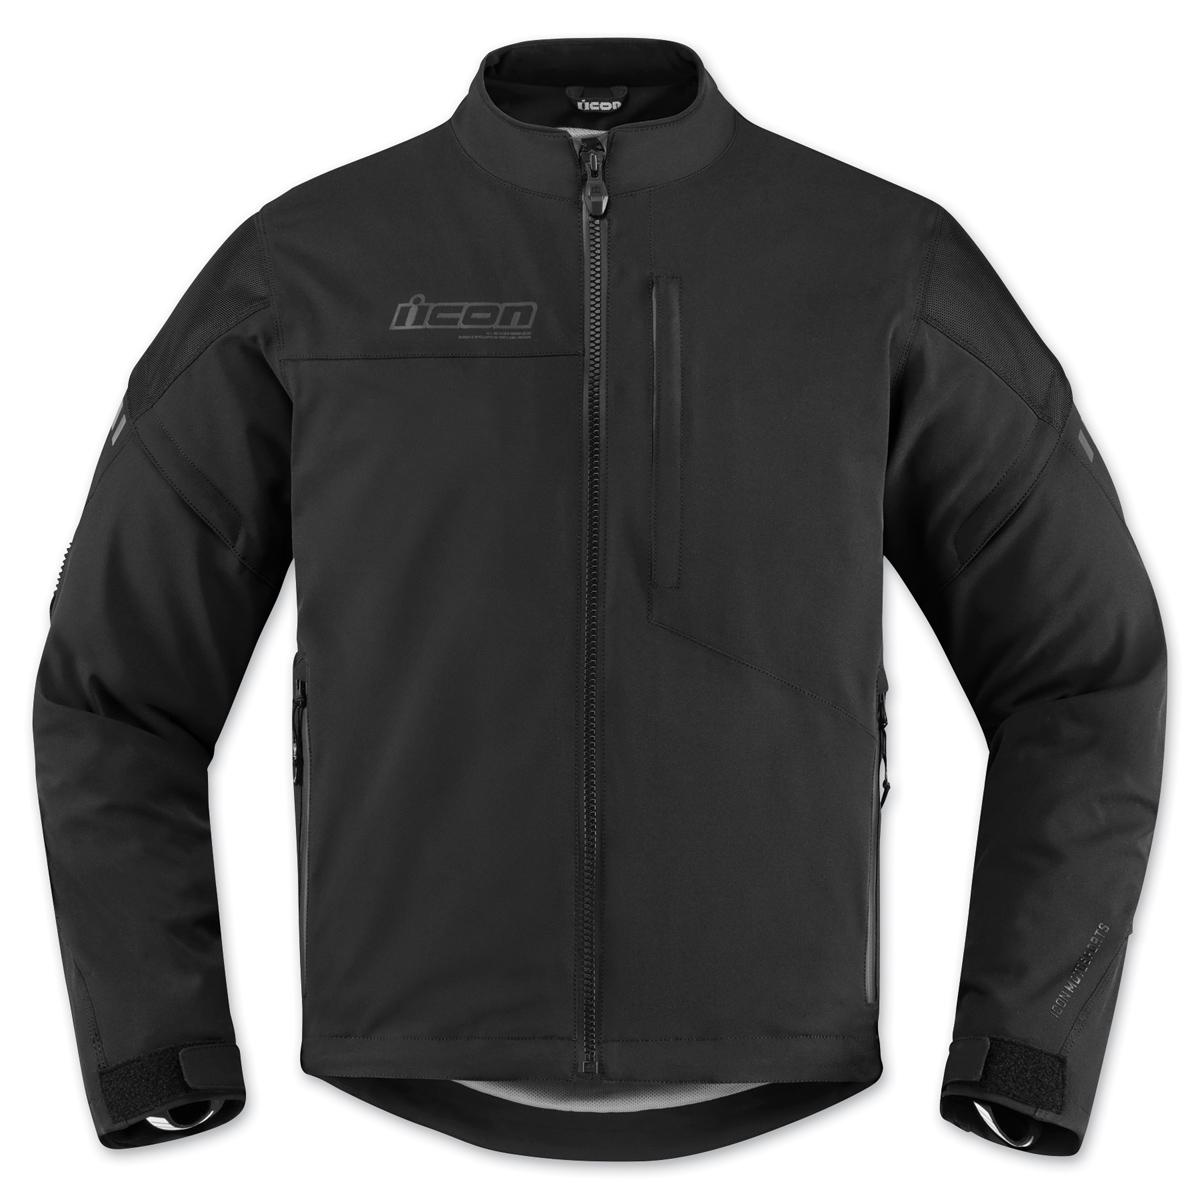 ICON Men's Tarmac Black Jacket